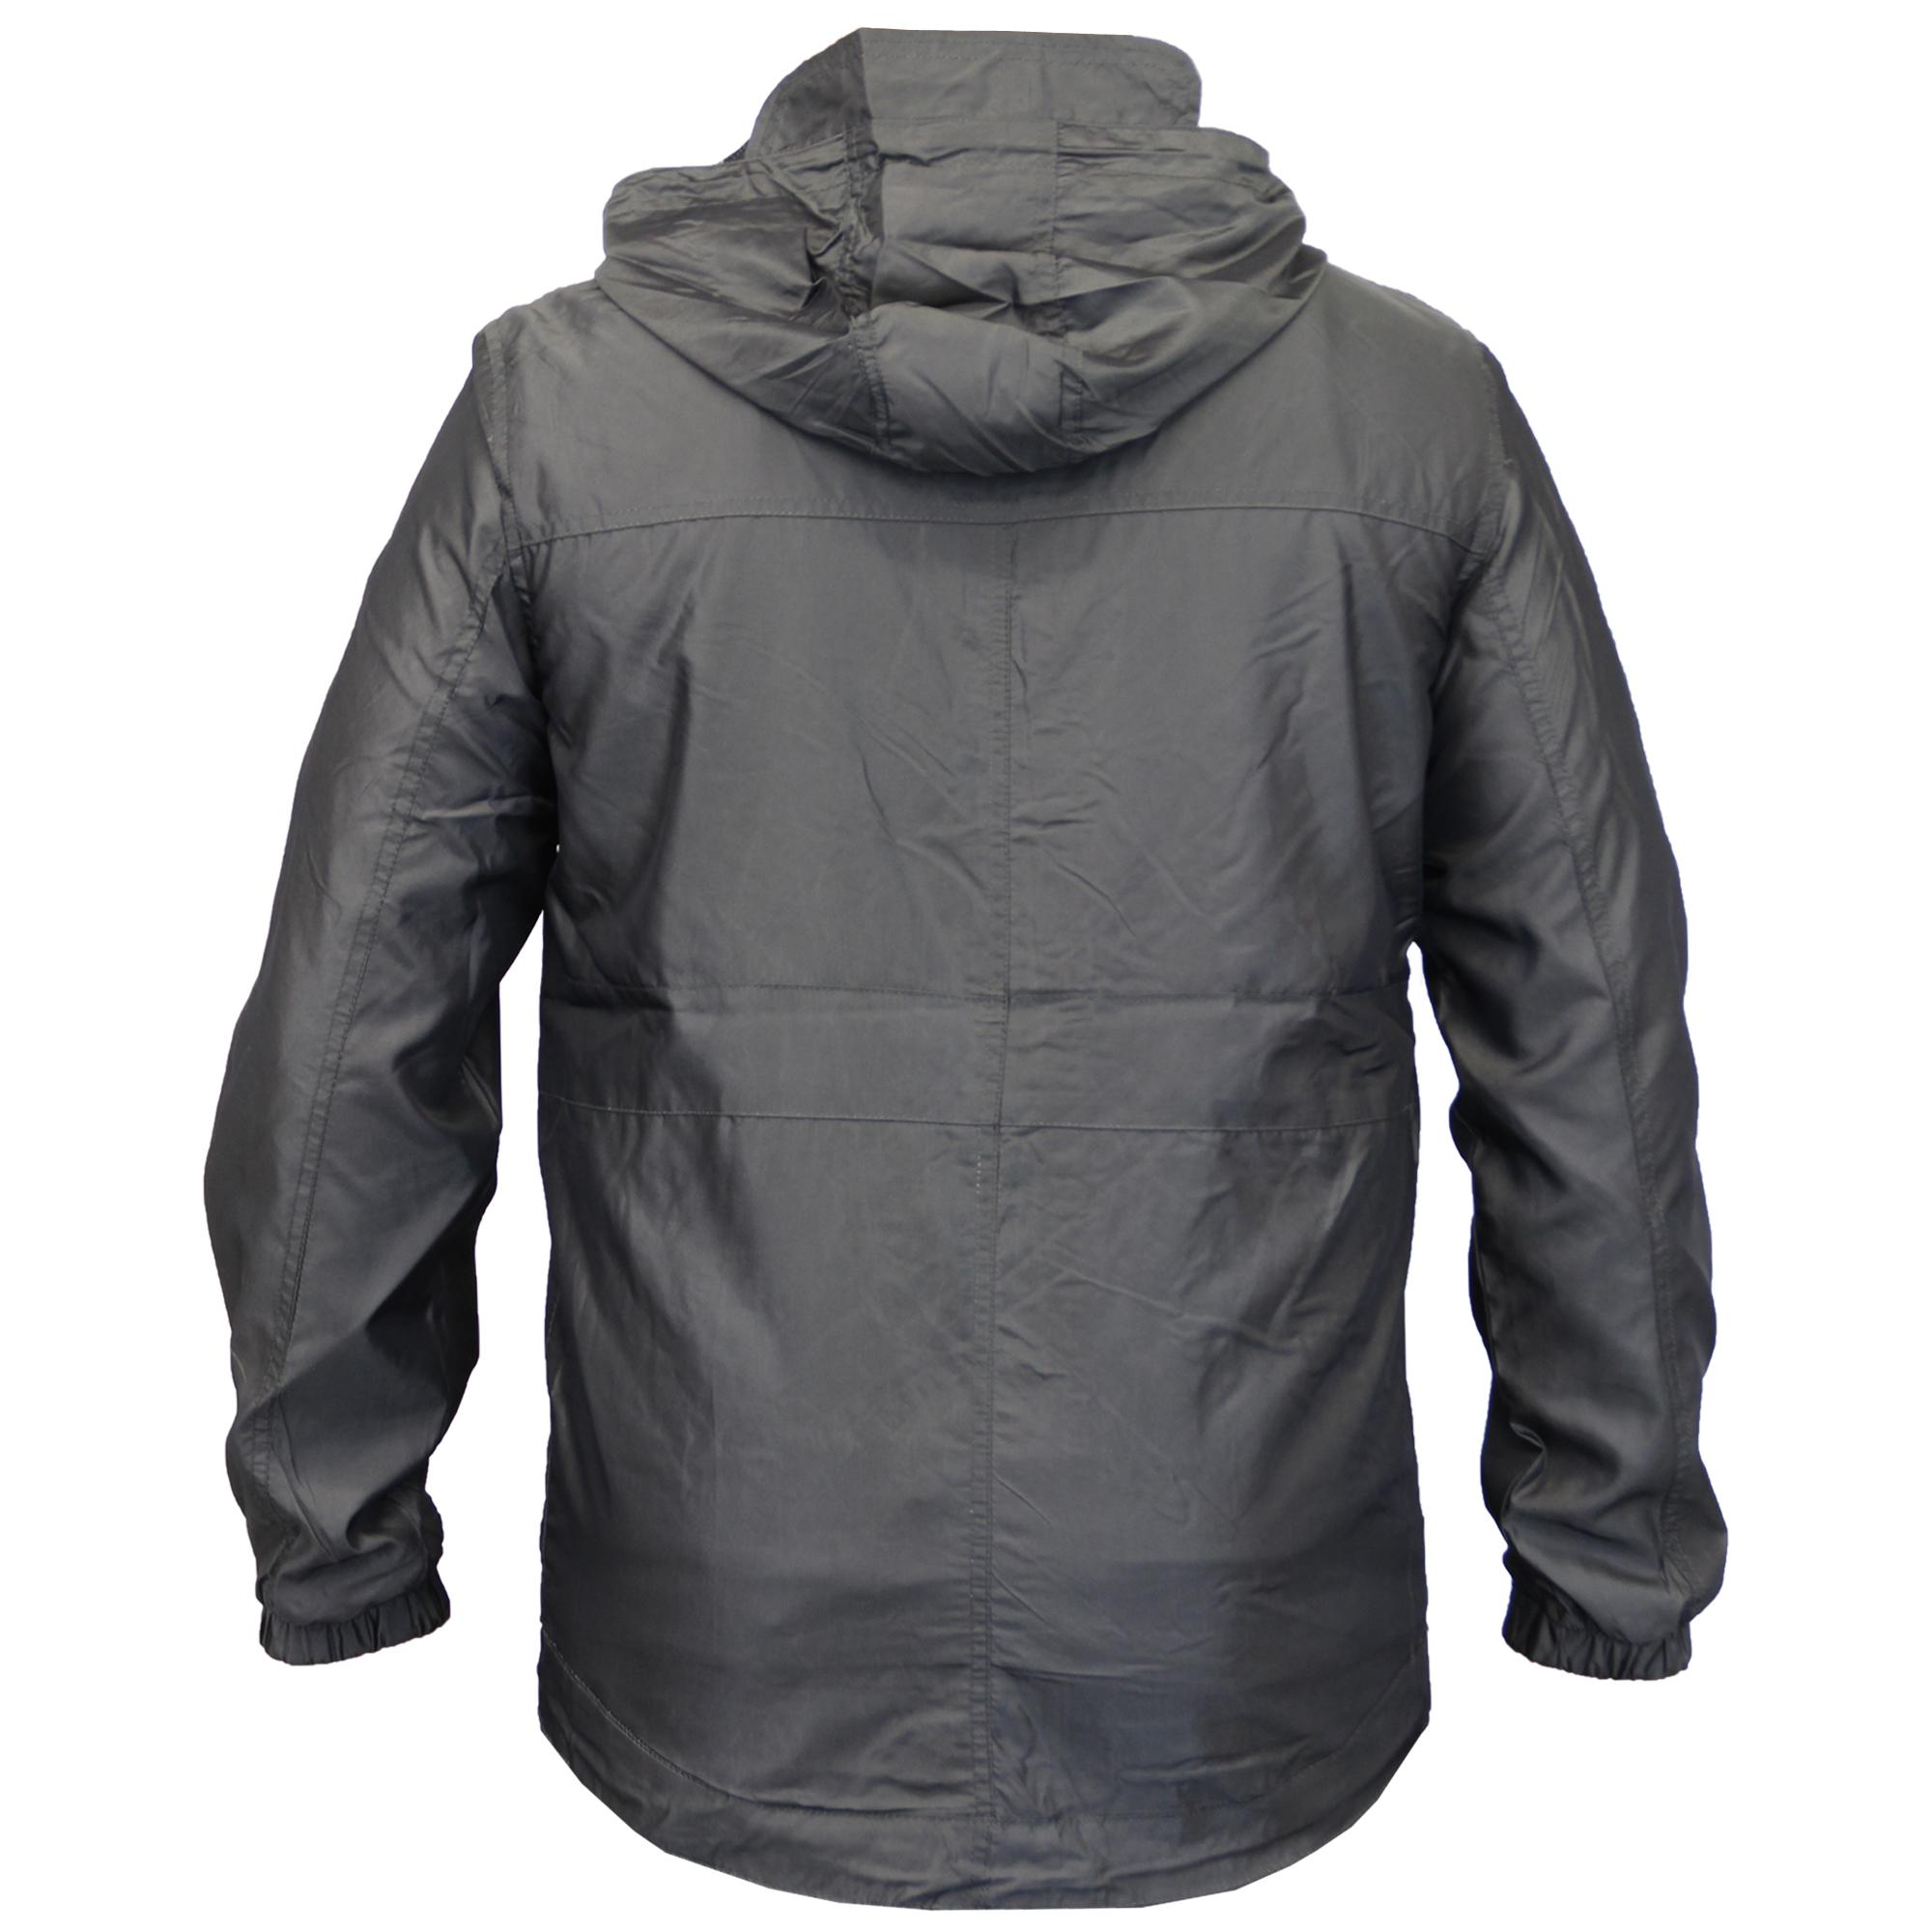 Mens-Windbreaker-Jacket-Crosshatch-Coat-Hooded-Mesh-Lined-Zip-Casual-Summer-New thumbnail 4